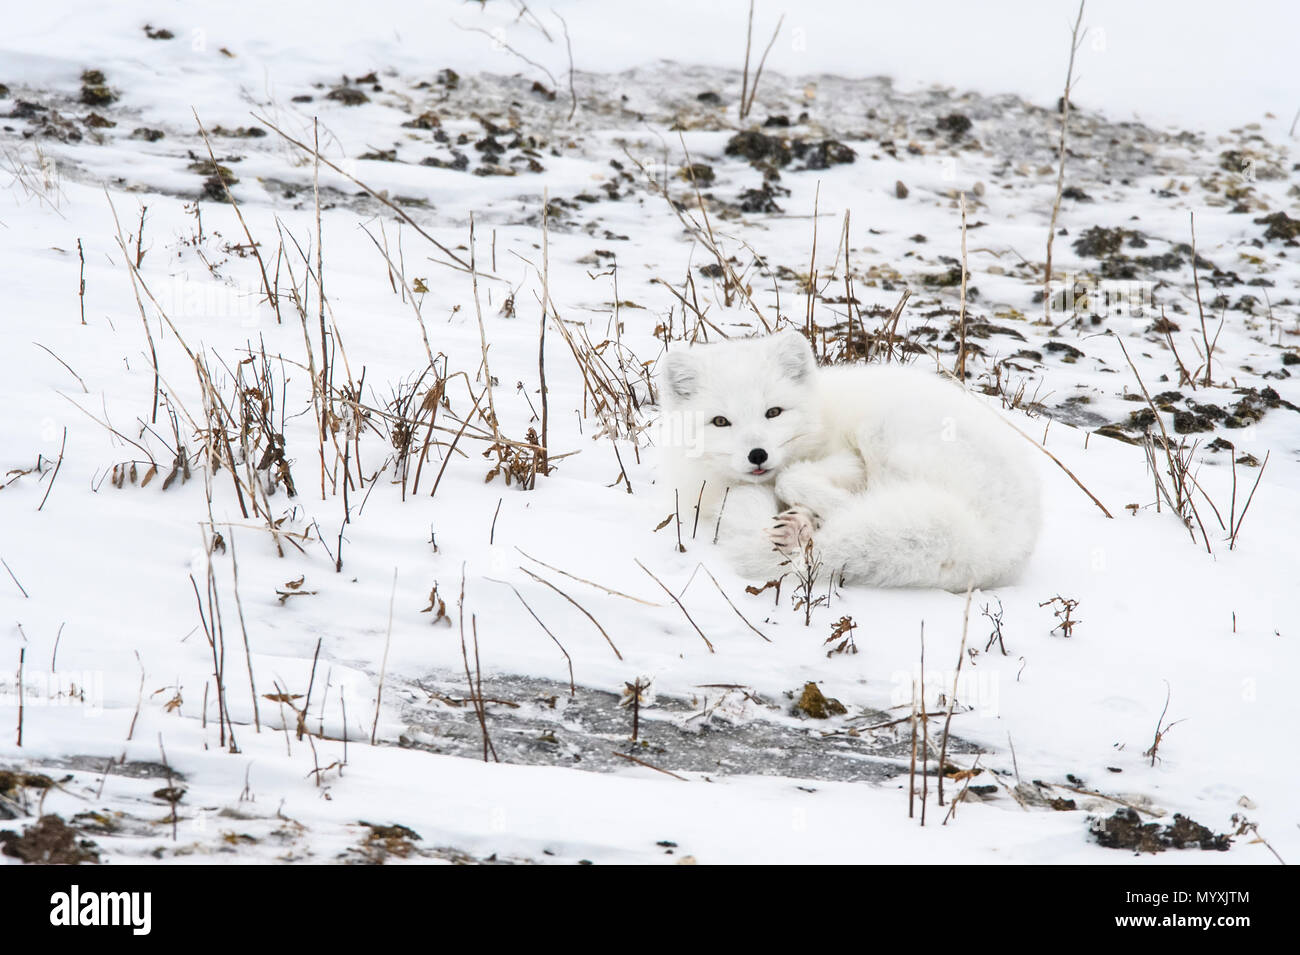 Arctic fox (Alopex, Vulpes lagopus) Resting on Hudson Bay coastal beach, Wapusk NP, Cape Churchill, Manitoba, Canada - Stock Image